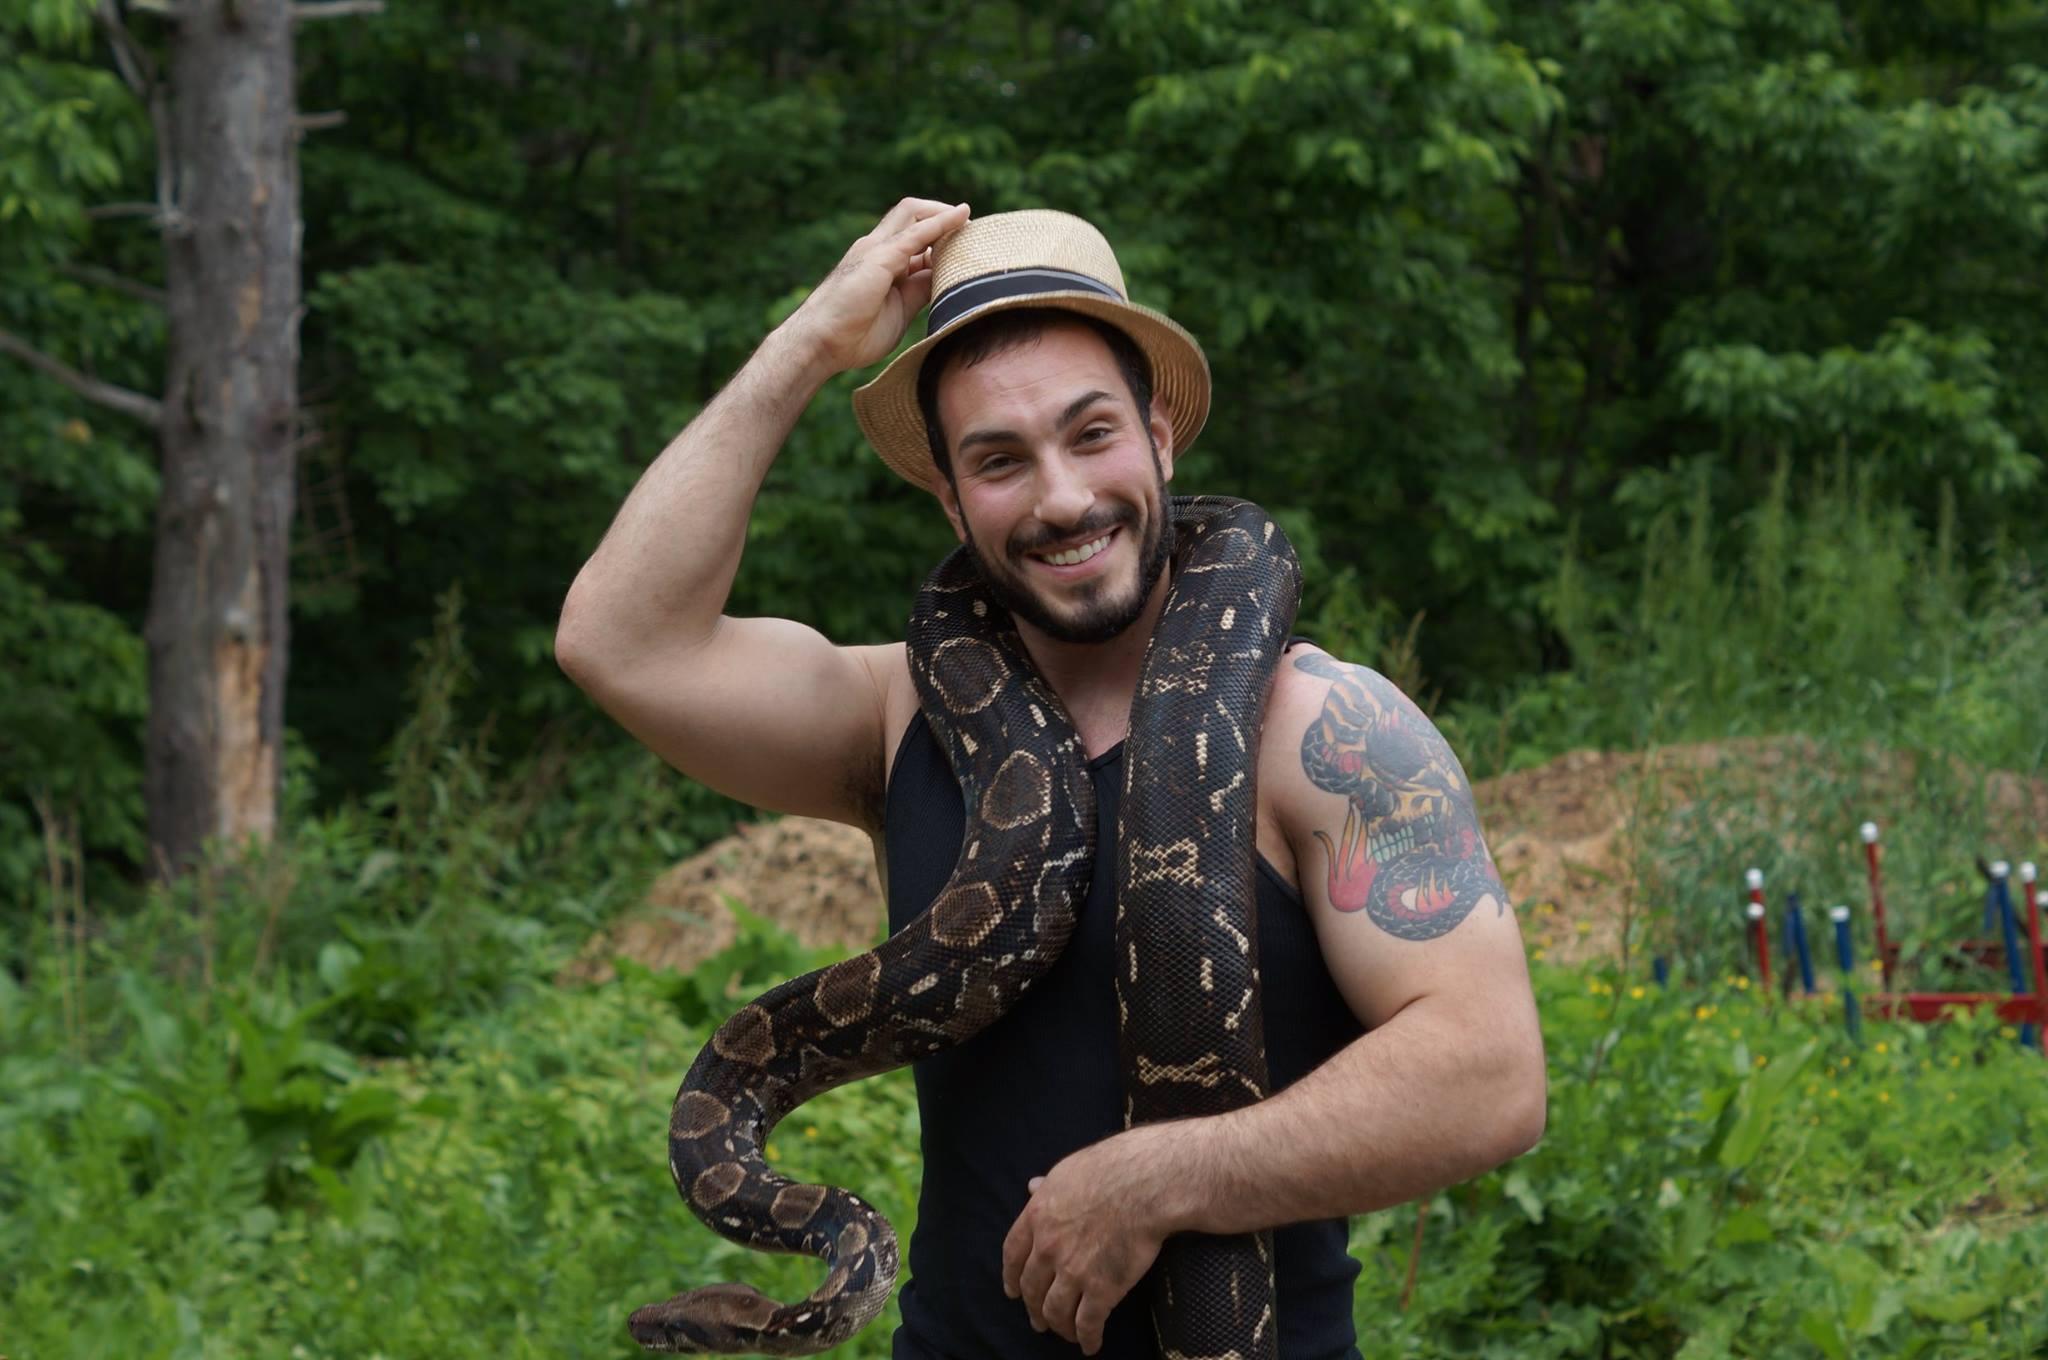 Jason Raimondi steps off set with one of his snakes.